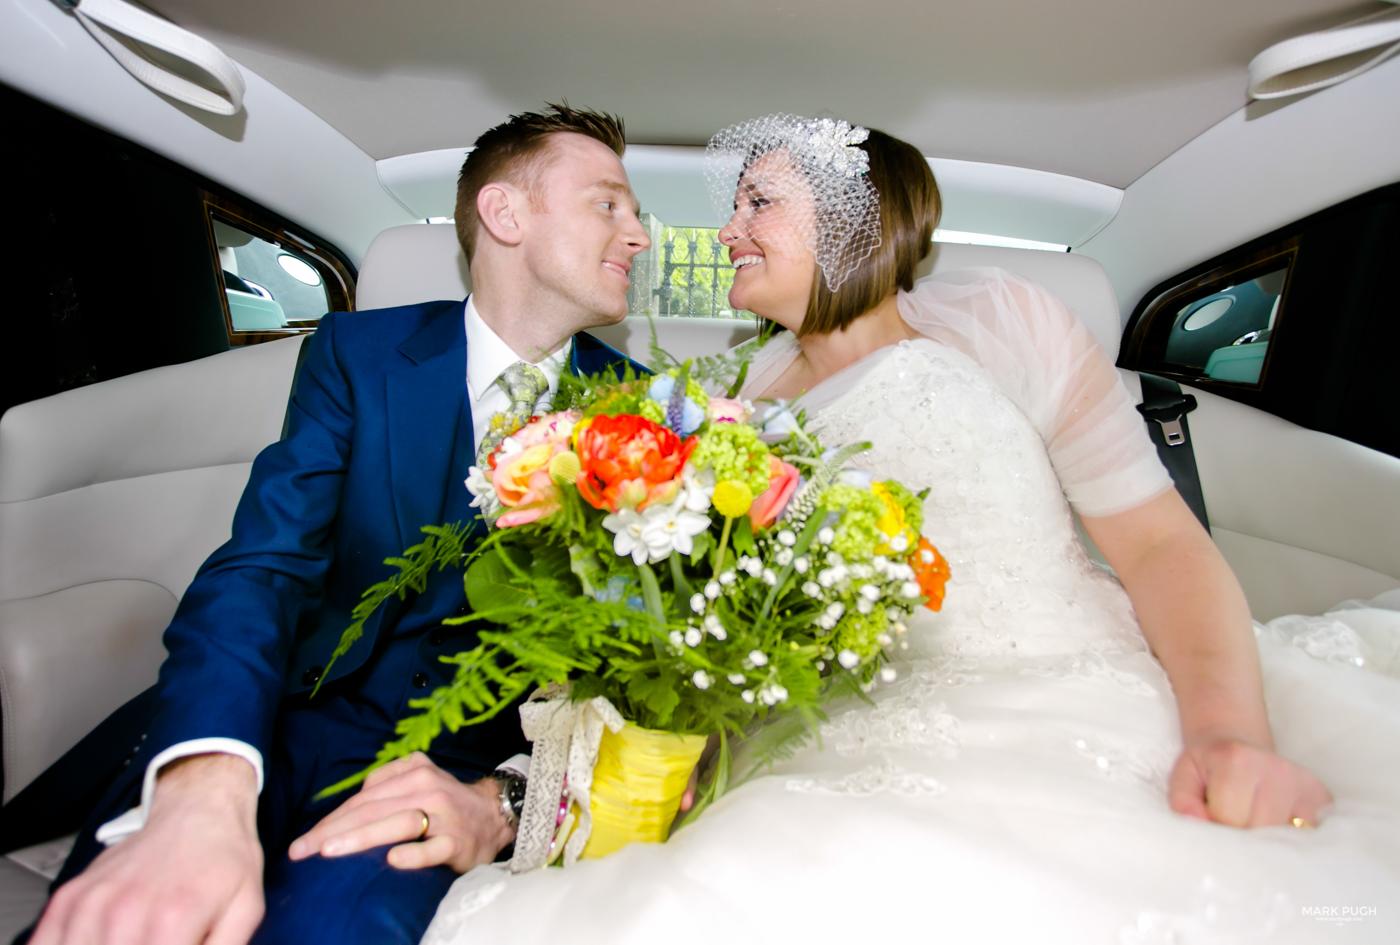 063 Wedding Photography Award winning Wedding Photographer and Videographer Mark Pugh www.markpugh.com.JPG